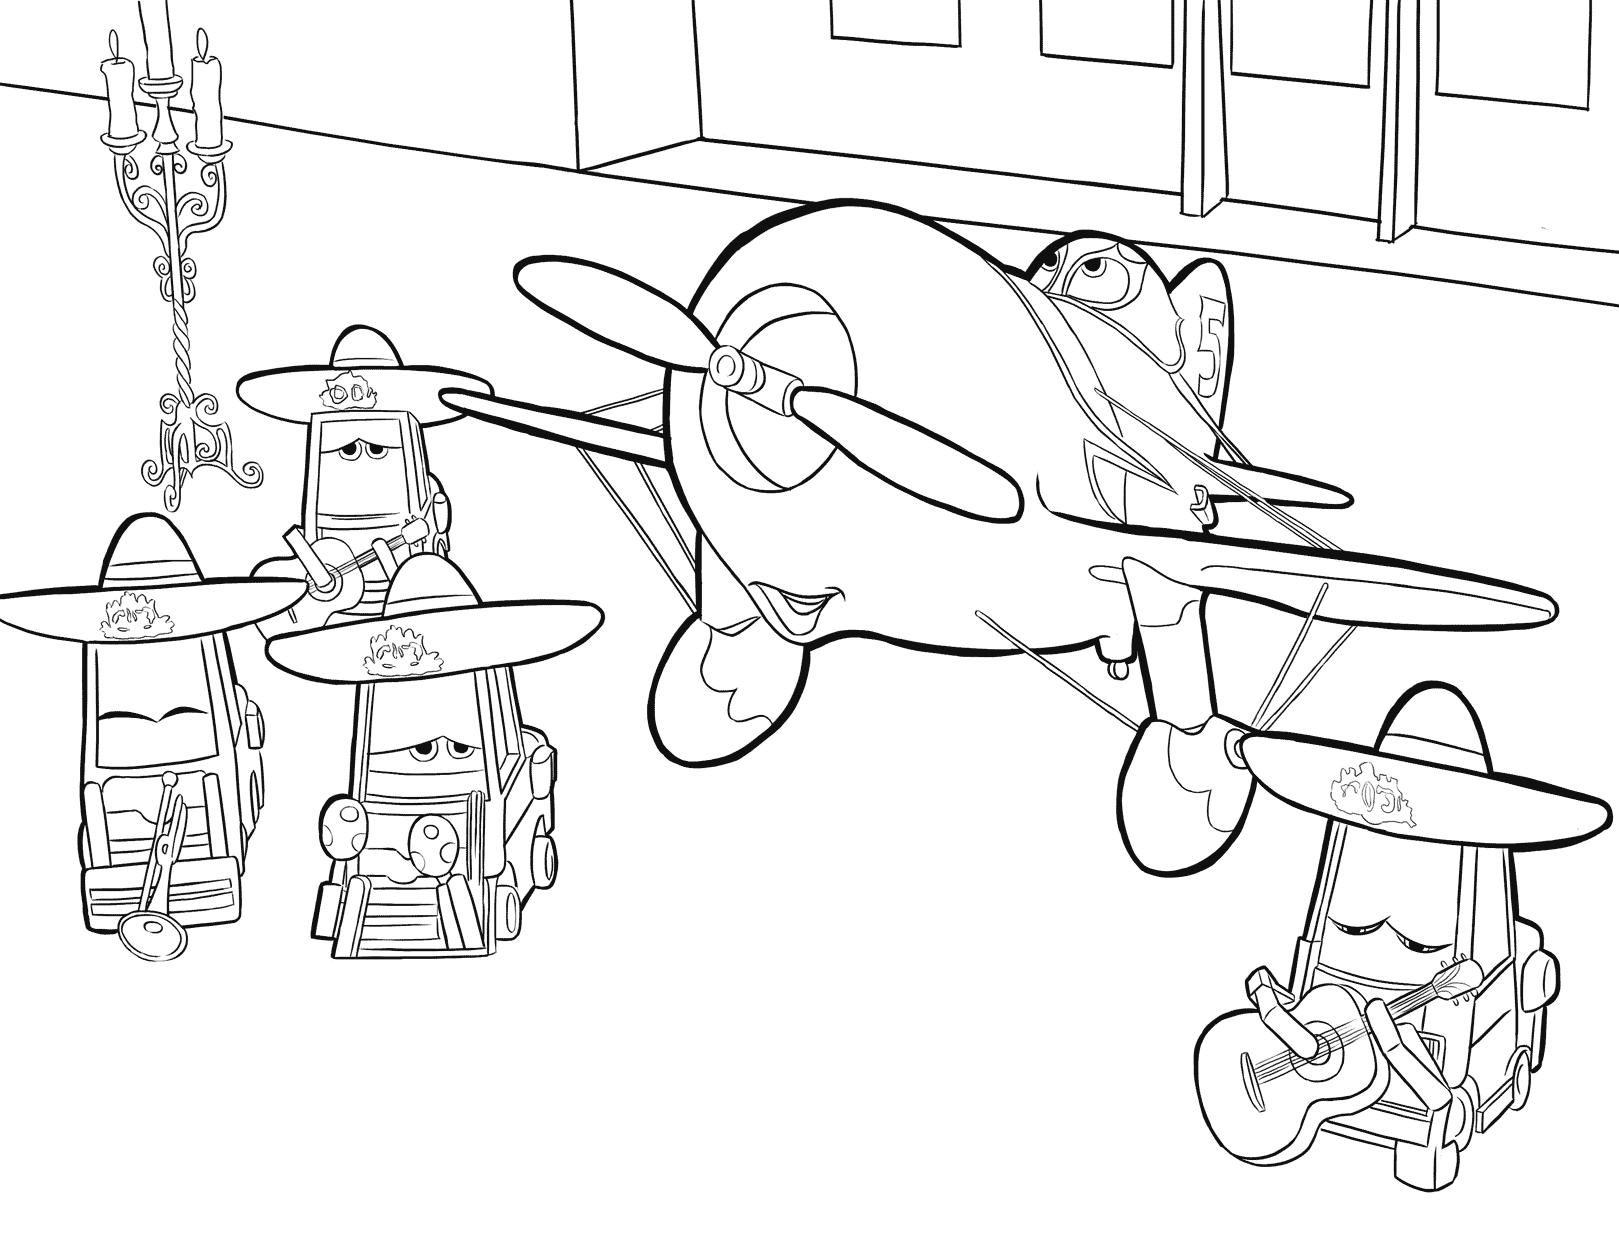 disney planes pictures to print disney planes coloring pages pictures planes print disney to